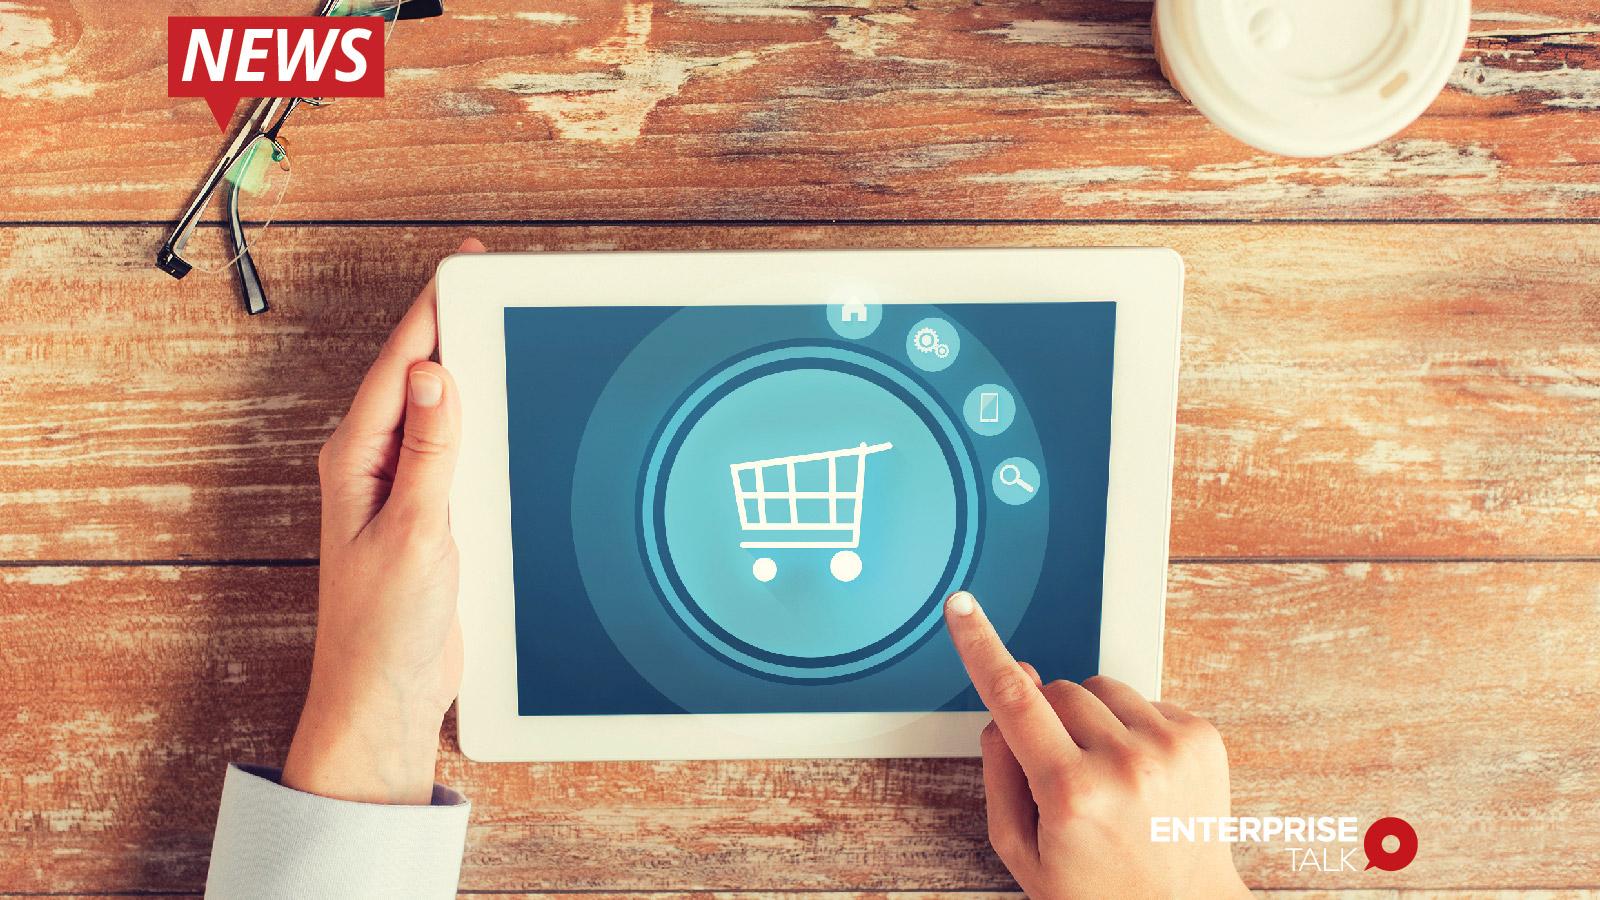 Online retail , e-commerce , e-commerce logistics businesses , EIS, retailers , Amazon, e-commerce supply chain